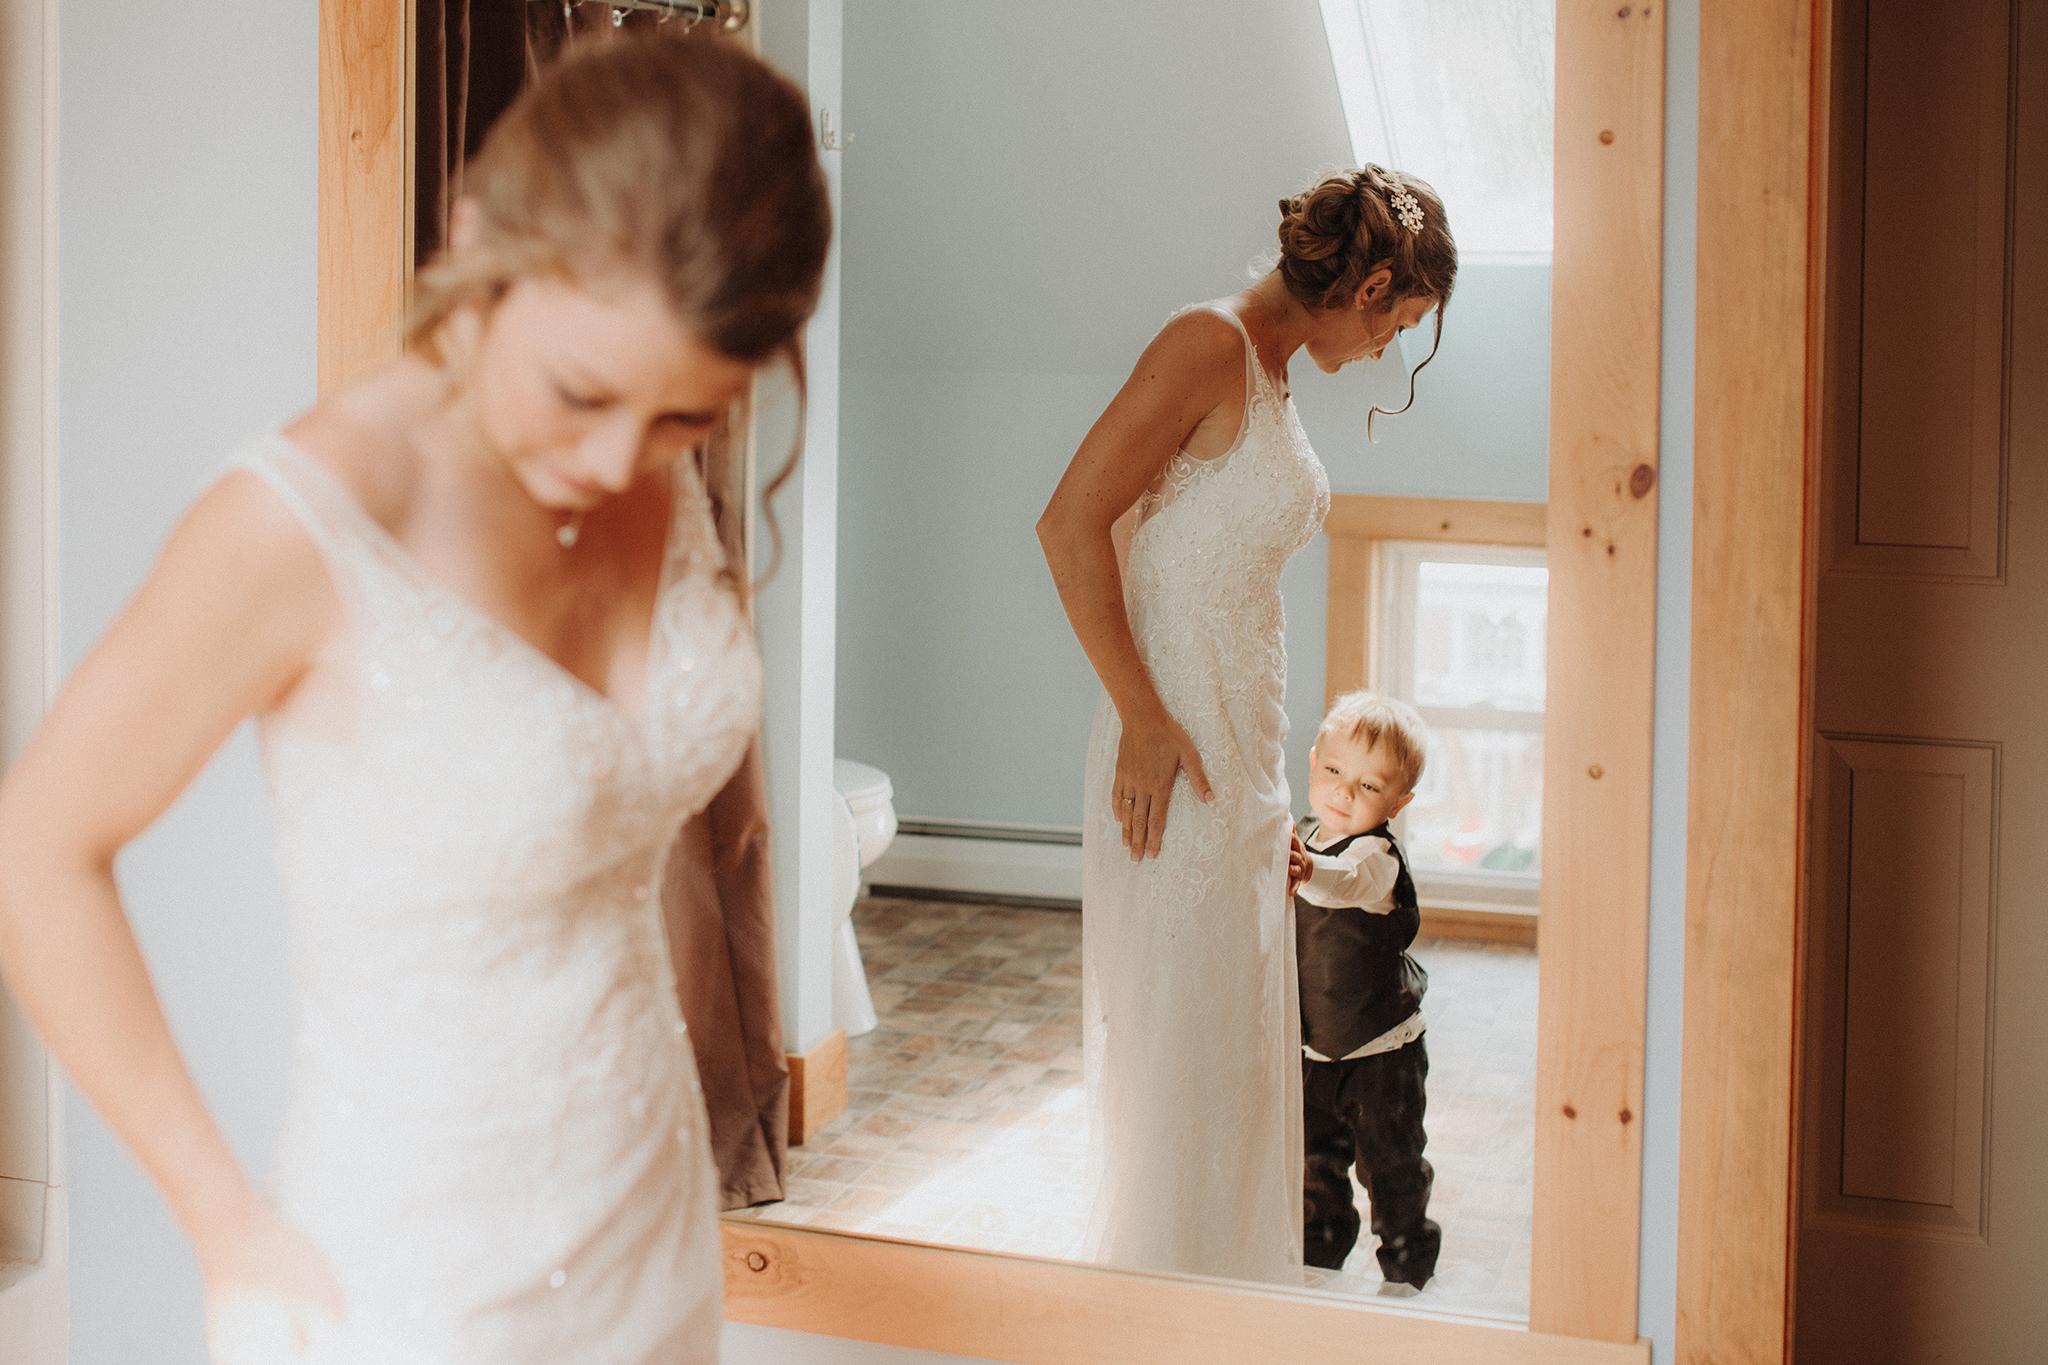 vermont-wedding-photographer-bride-getting-ready-with-kids.jpg